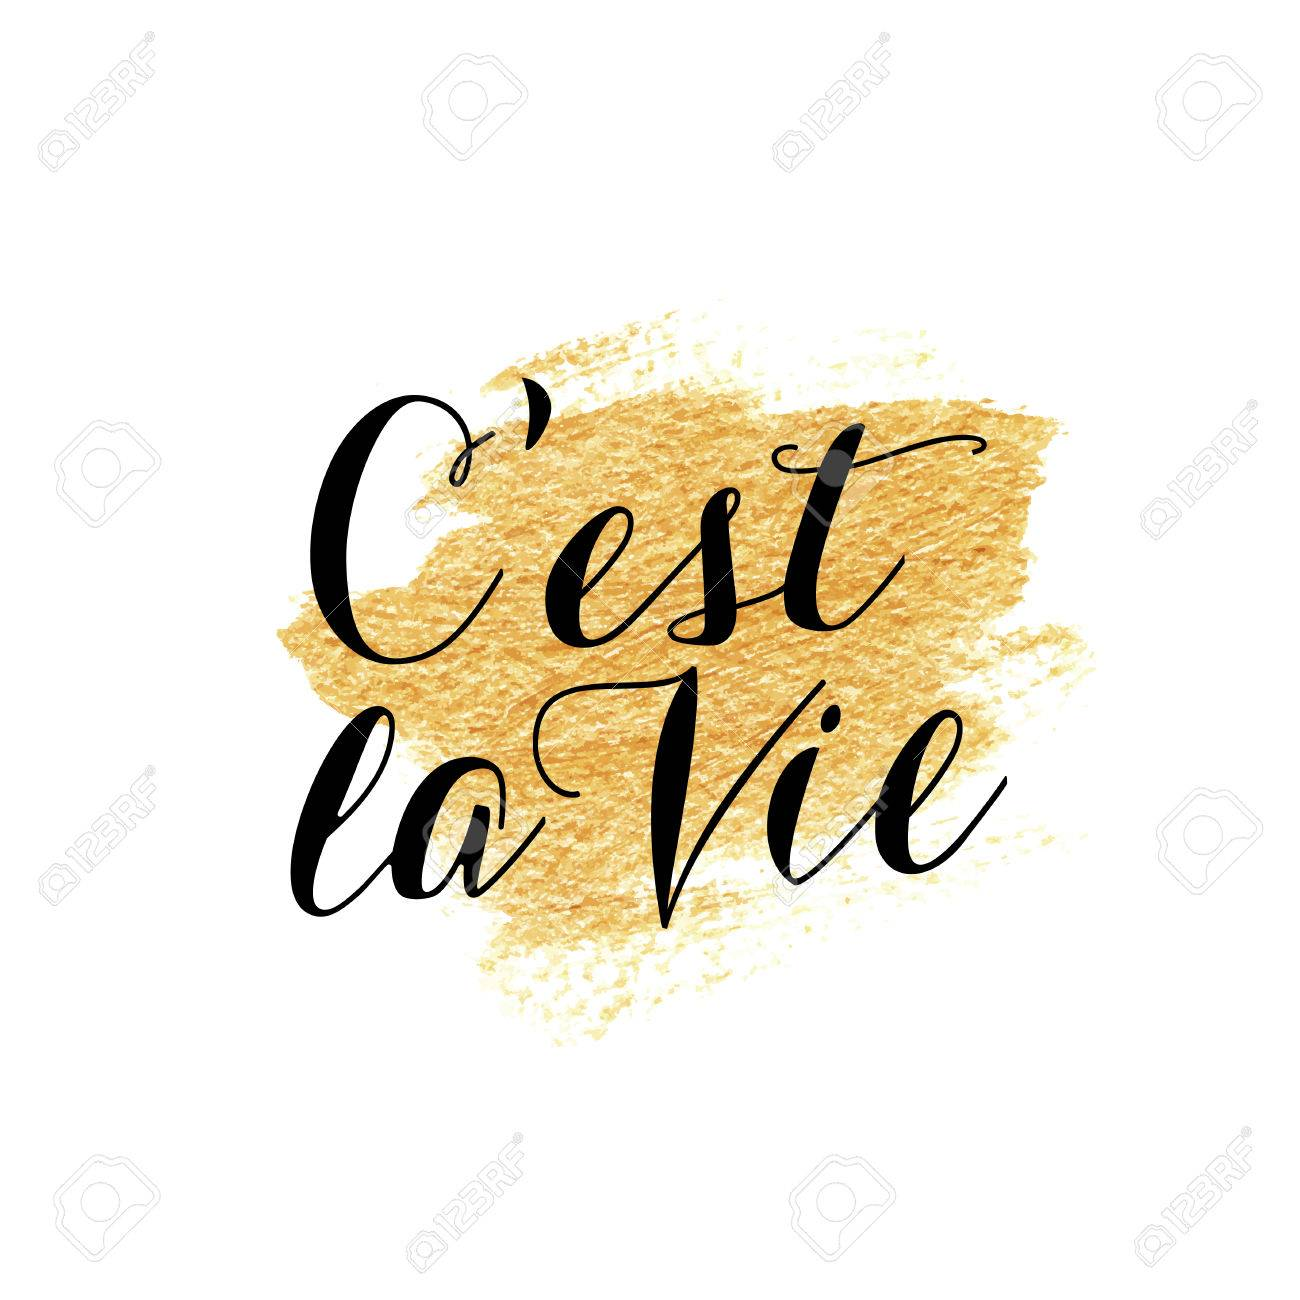 C Est La Vie French Hand Lettering Handmade Calligraphy Translation